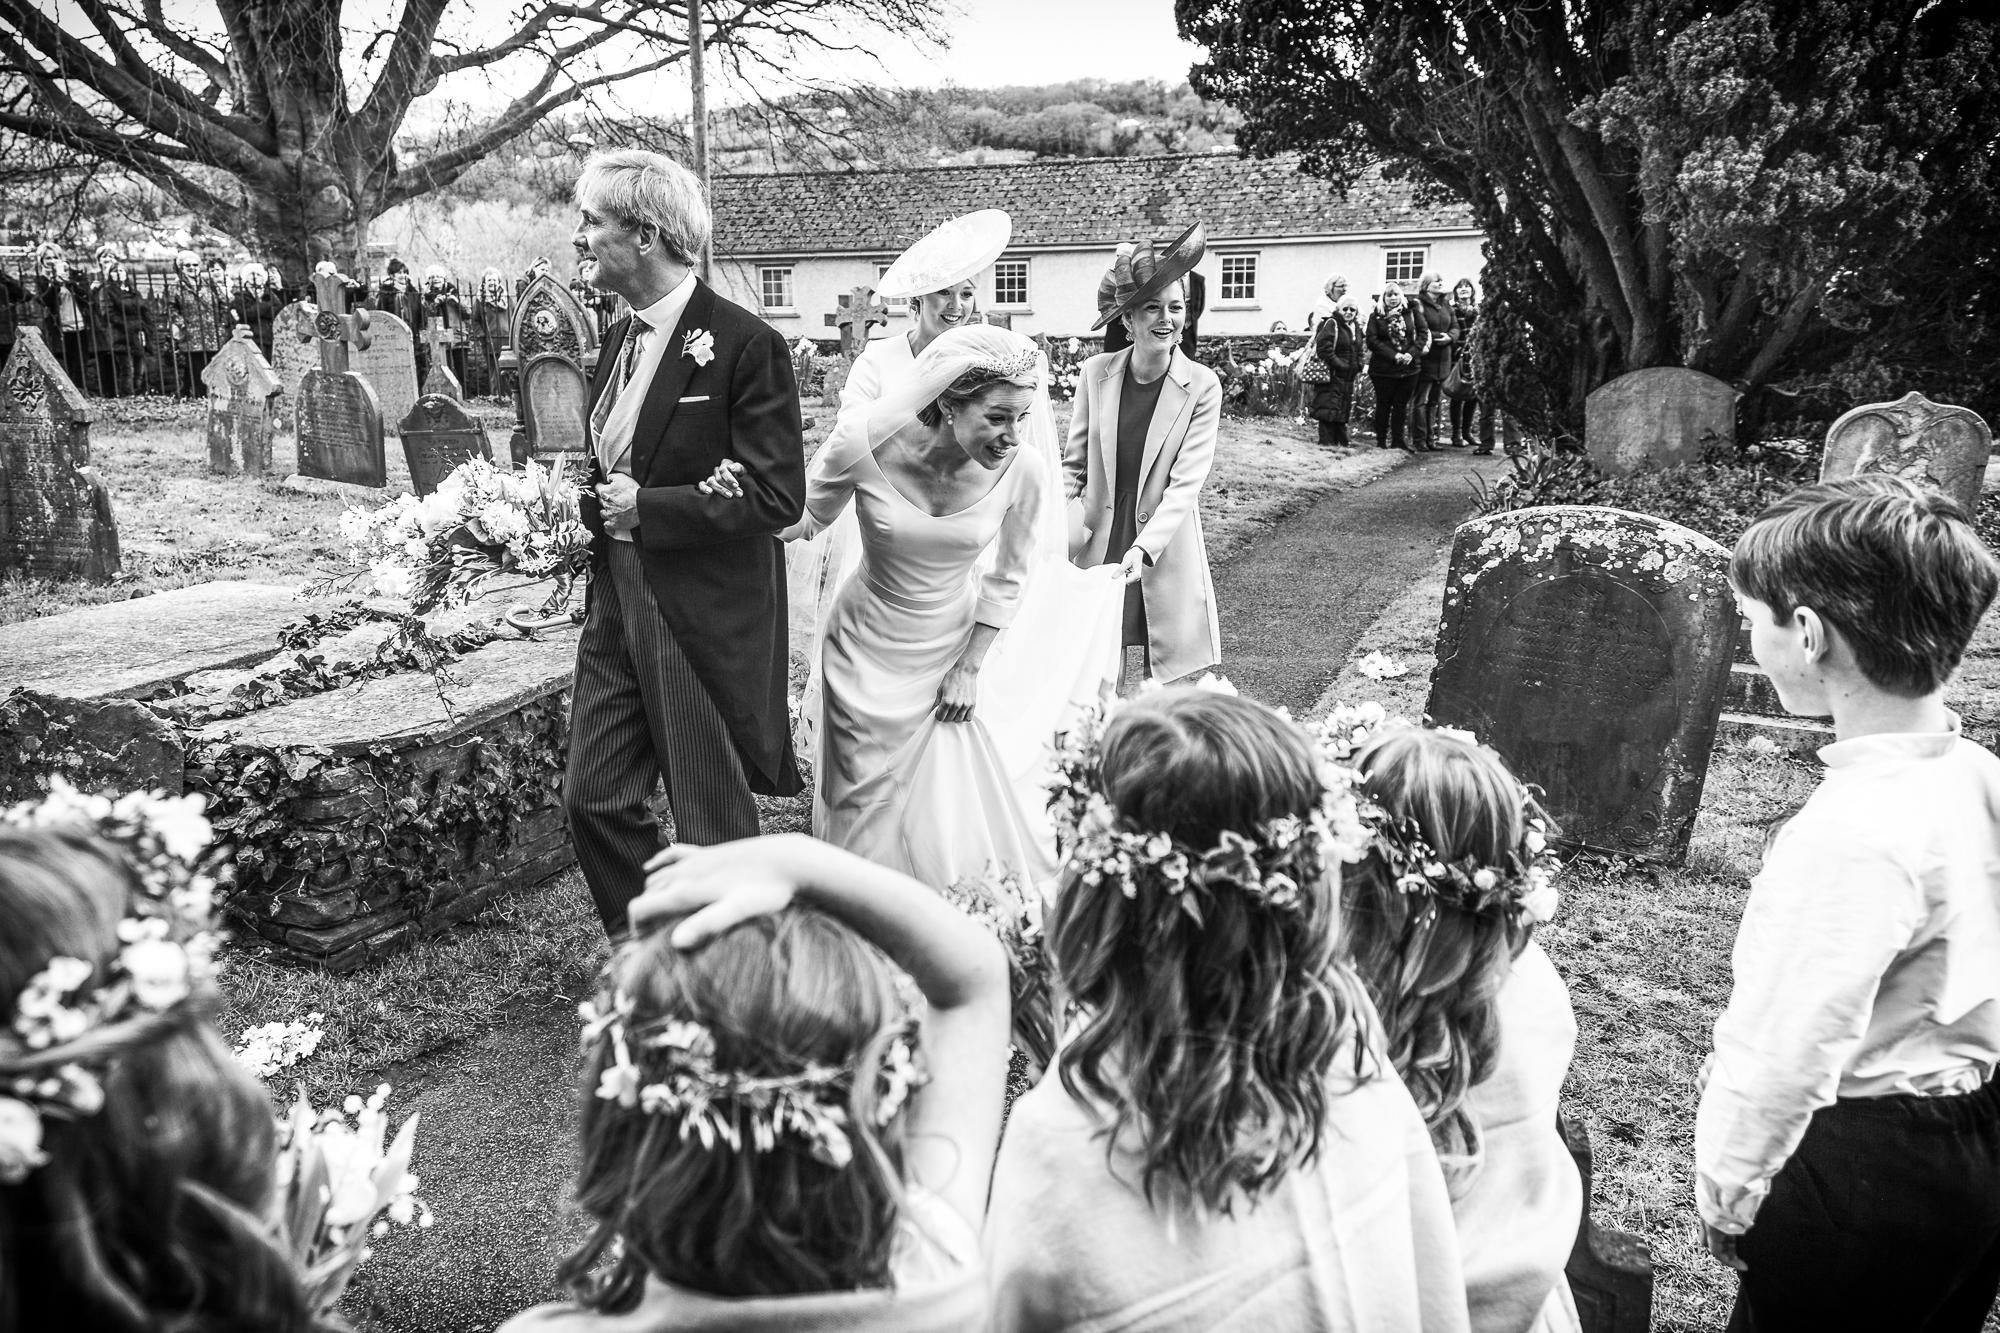 wedding photography bridal stride 1 (7 of 12).jpg